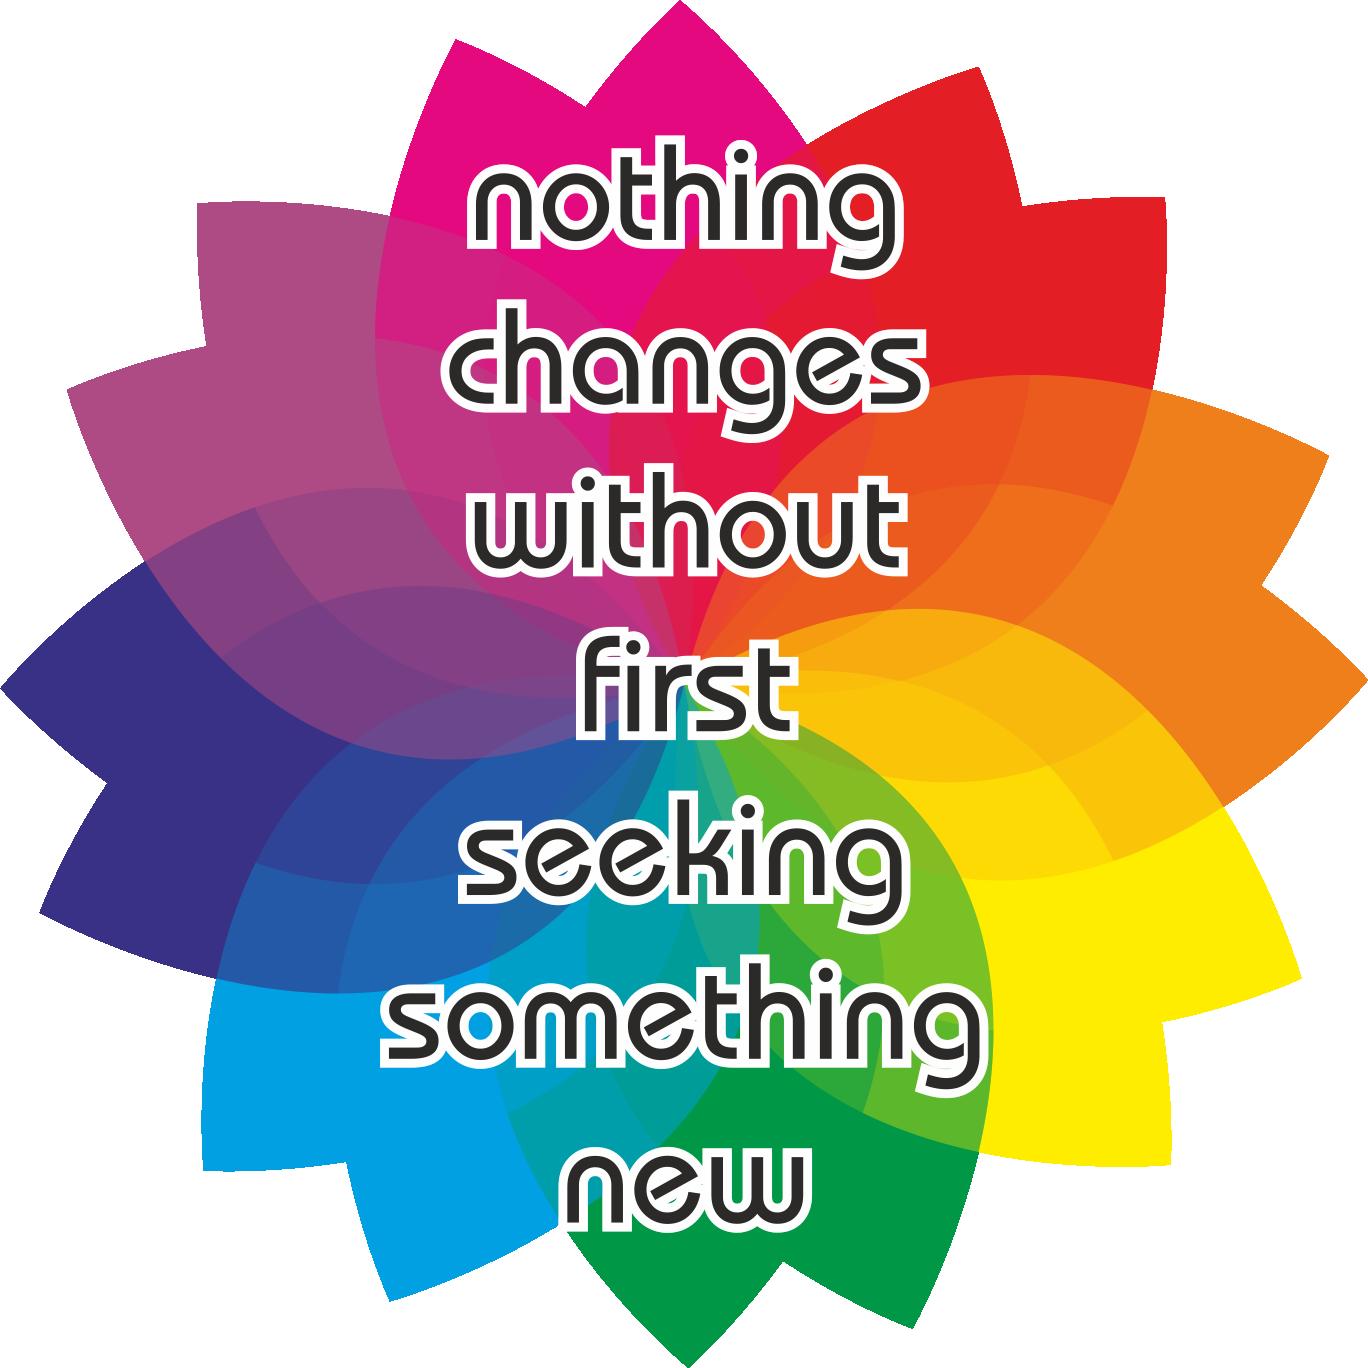 Seeking Something New